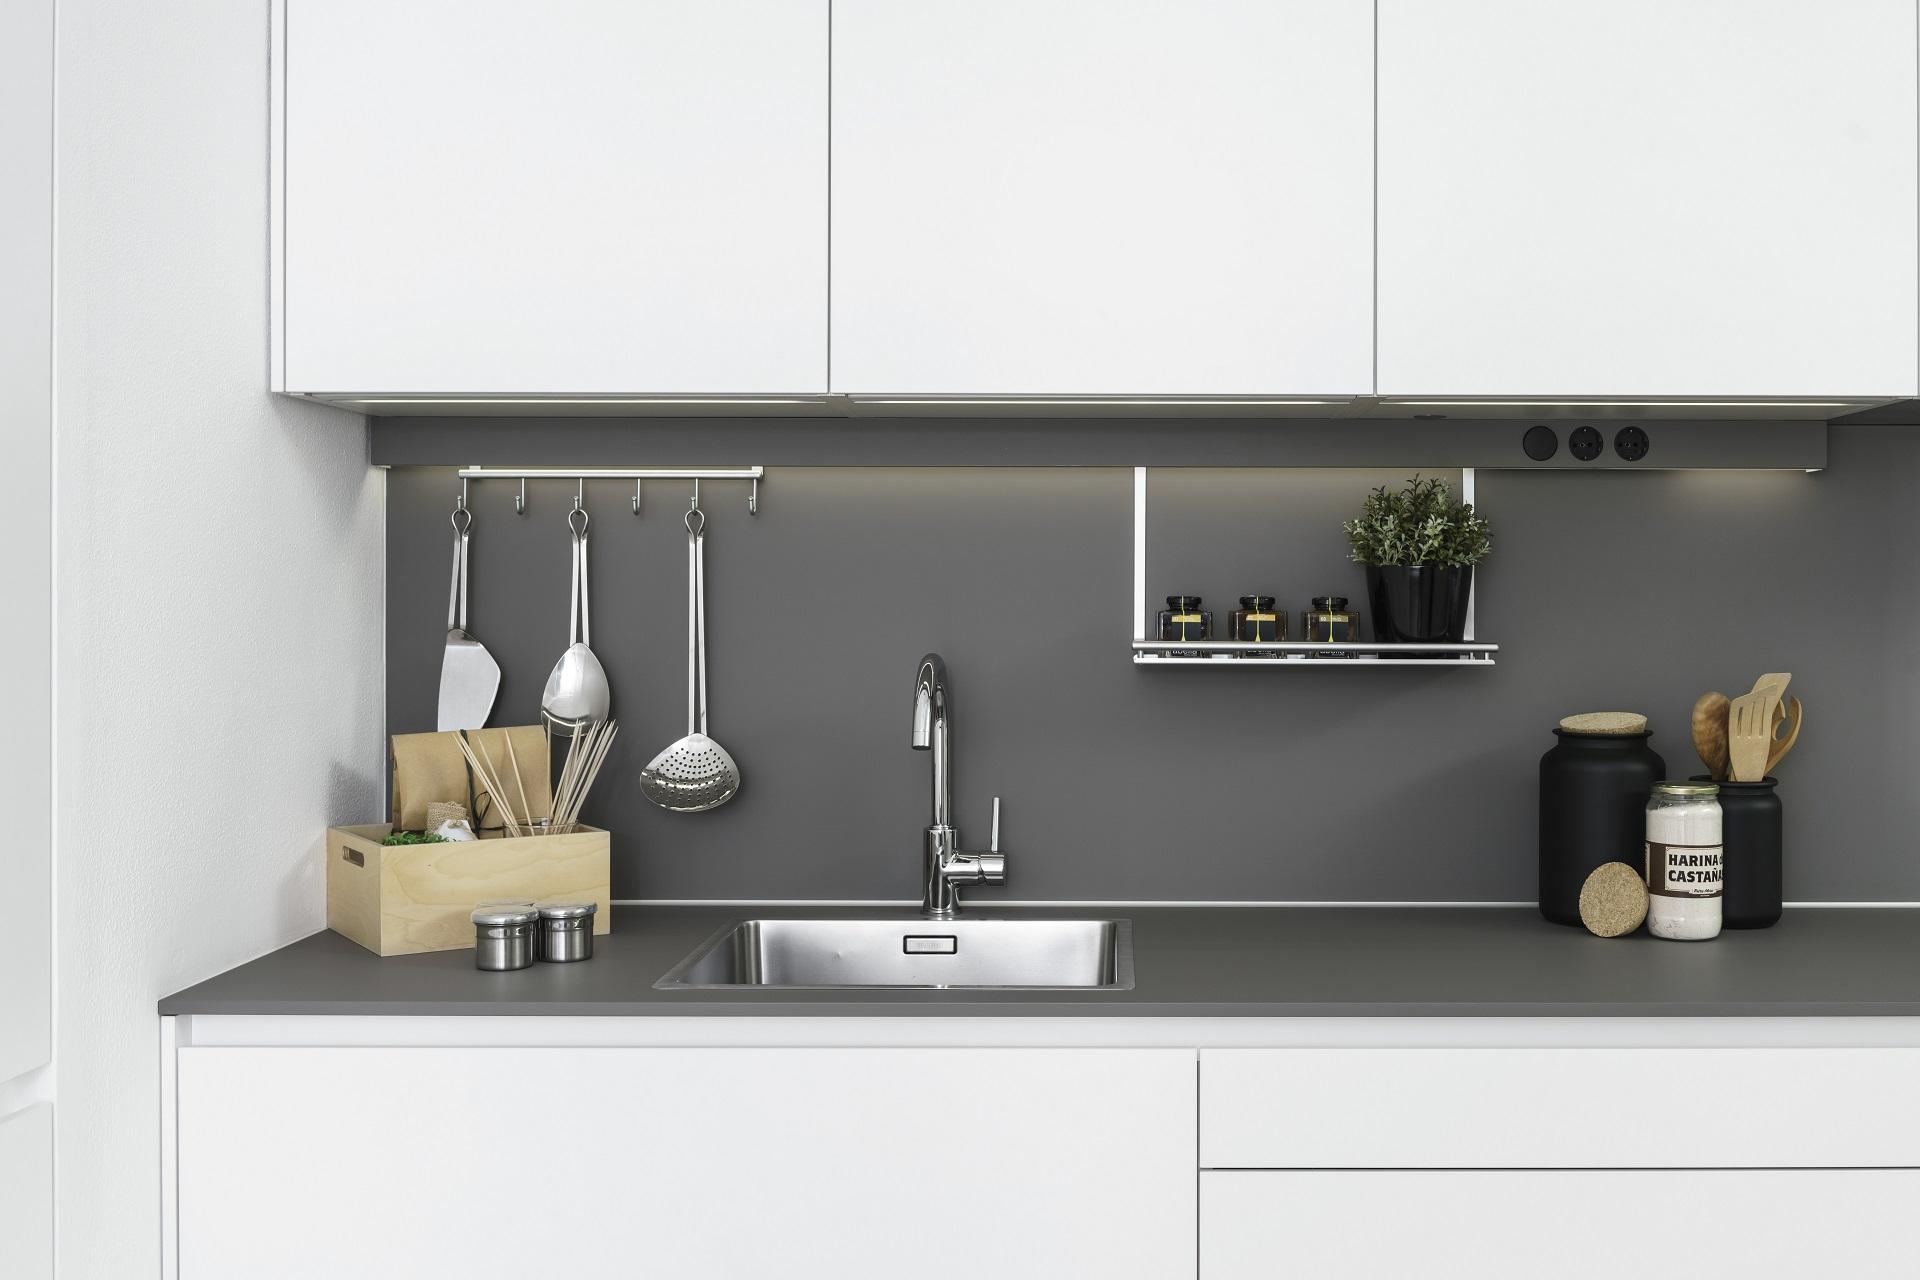 Image cocina-oferta-santiago-interiores